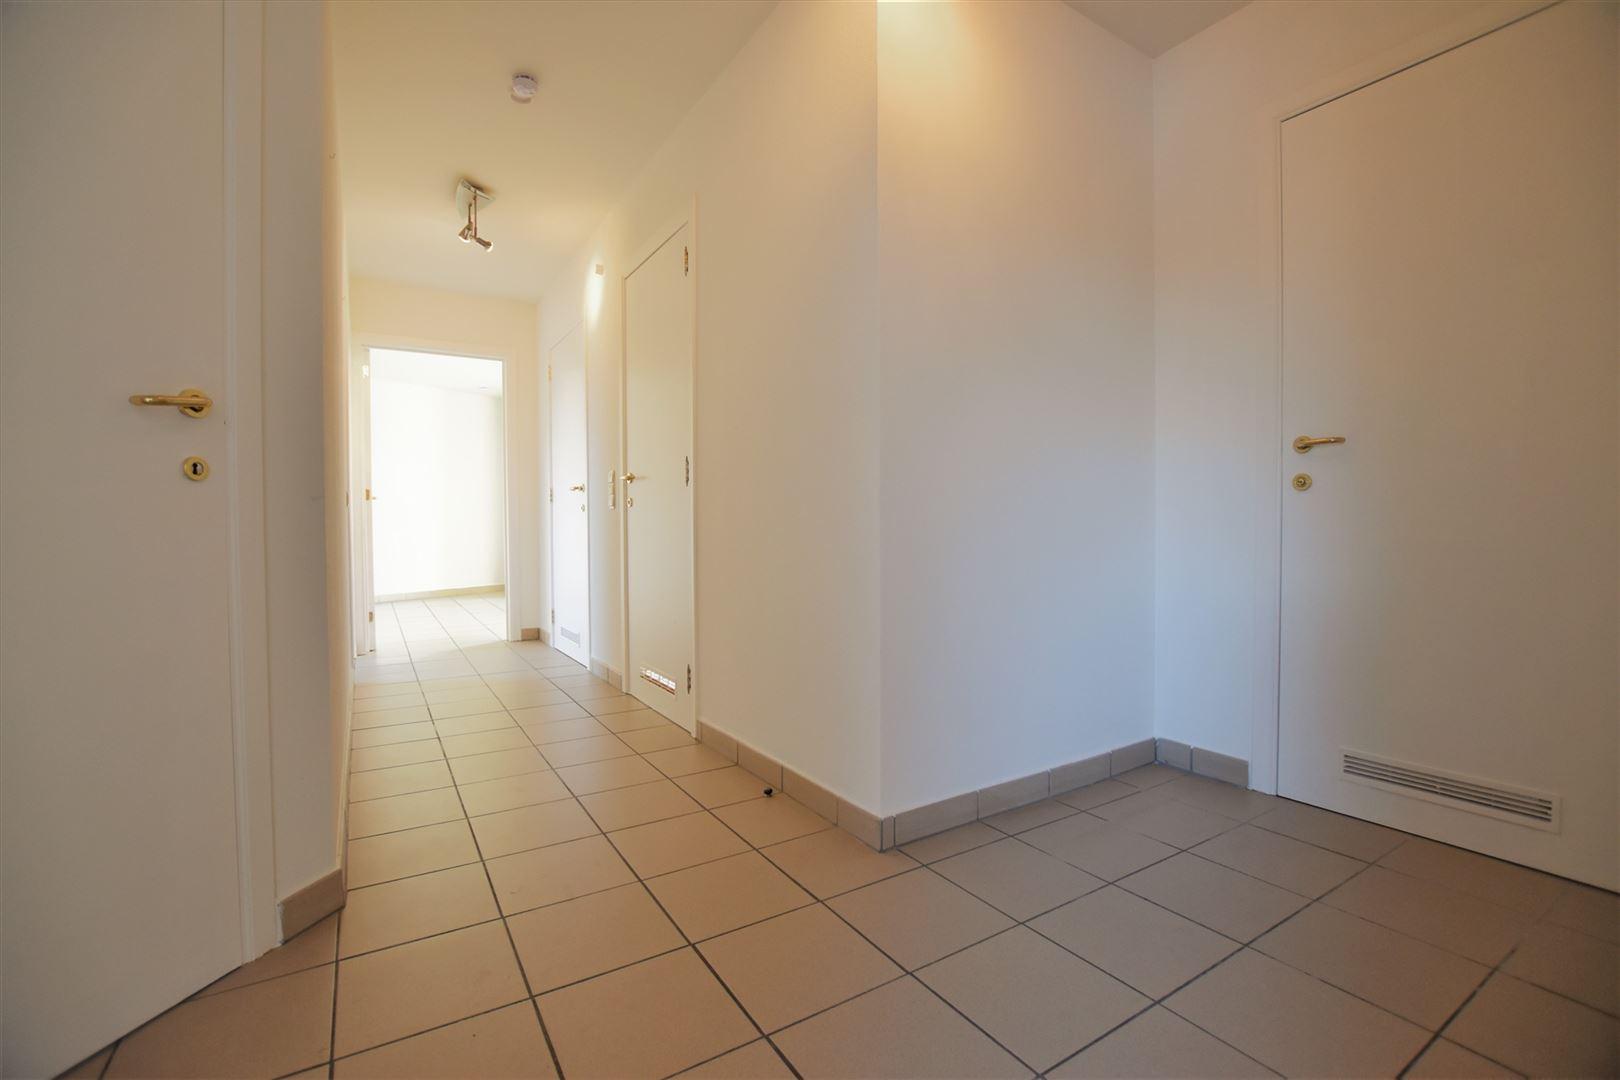 Foto 16 : Appartement te 9280 Lebbeke (België) - Prijs € 645